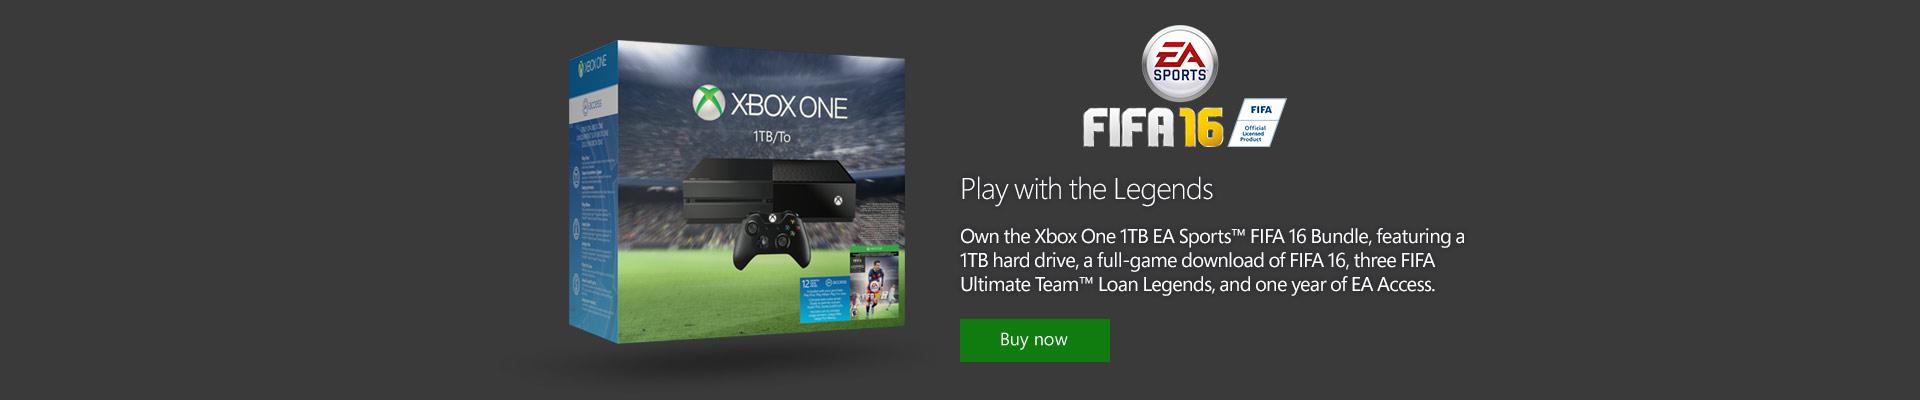 FIFA 16 bundle